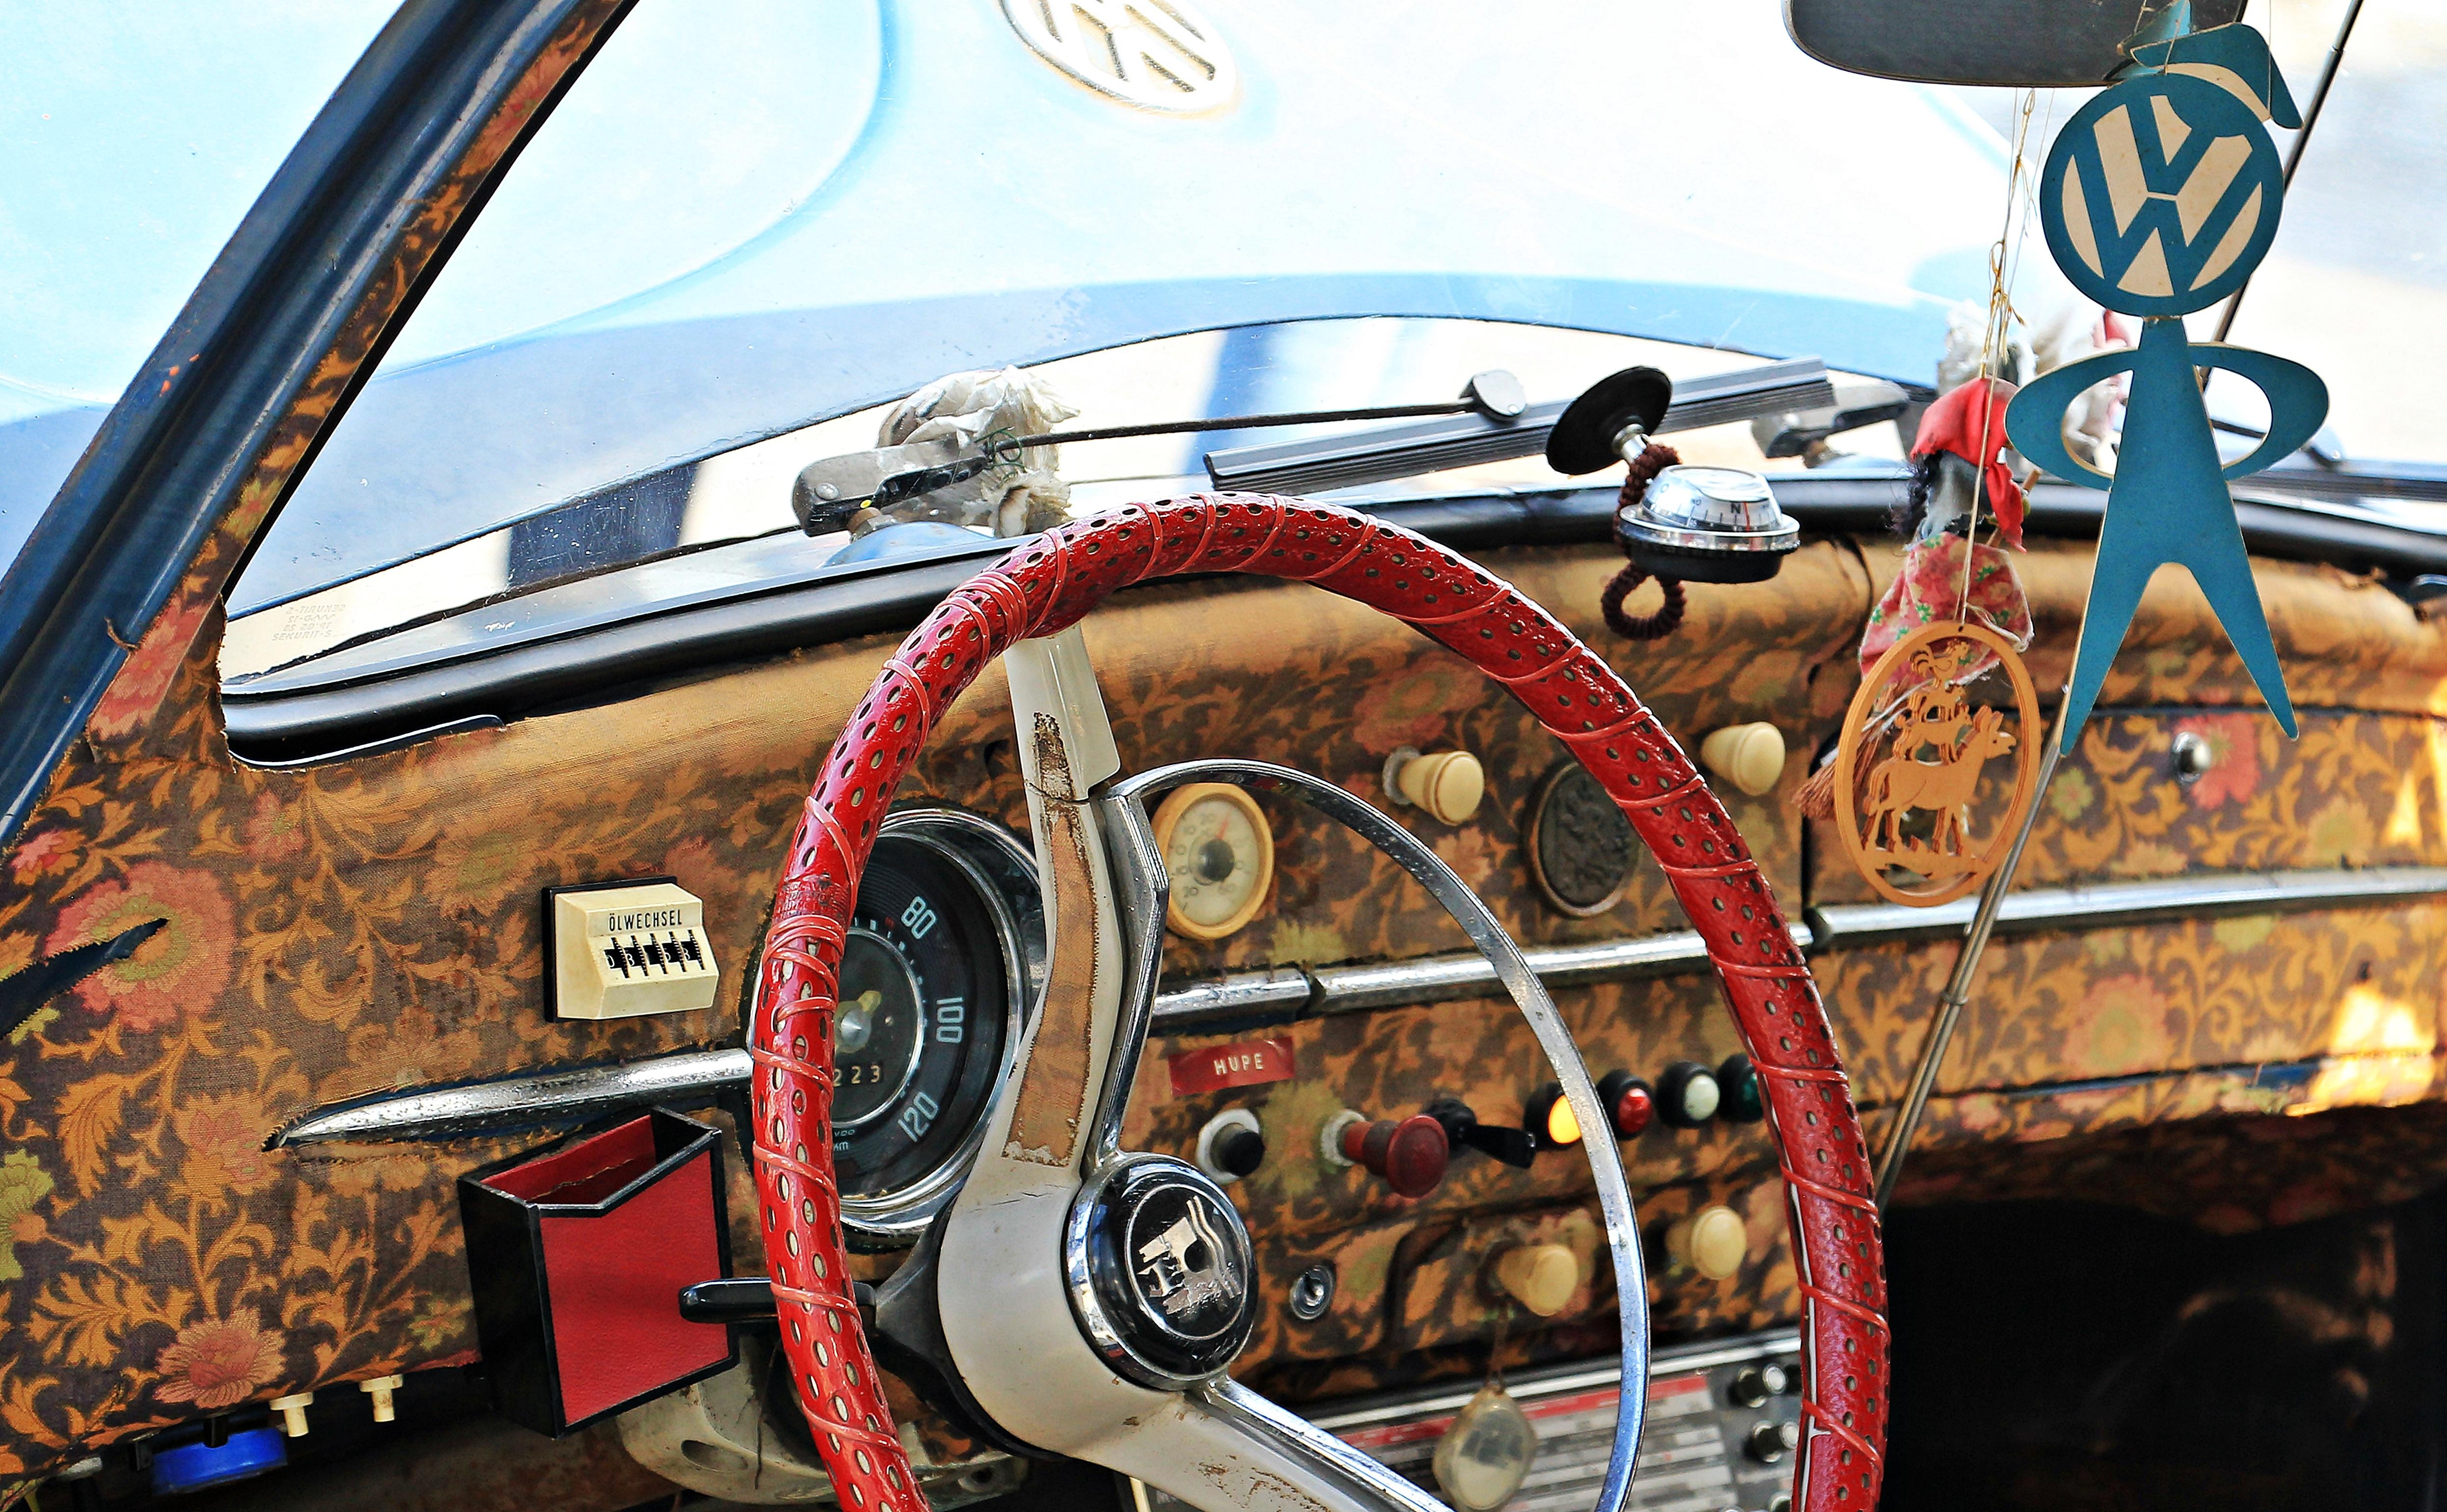 https://get.pxhere.com/photo/car-wheel-retro-interior-vw-volkswagen-old-vehicle-auto-memory-nostalgia-automotive-motor-vehicle-vintage-car-close-up-herbie-vw-beetle-details-germany-oldtimer-hippie-nostalgic-detail-classic-german-beetle-past-dare-antique-car-volkswagen-vw-old-time-hippie-car-year-built-1956-land-vehicle-automobile-make-luxury-vehicle-549637.jpg